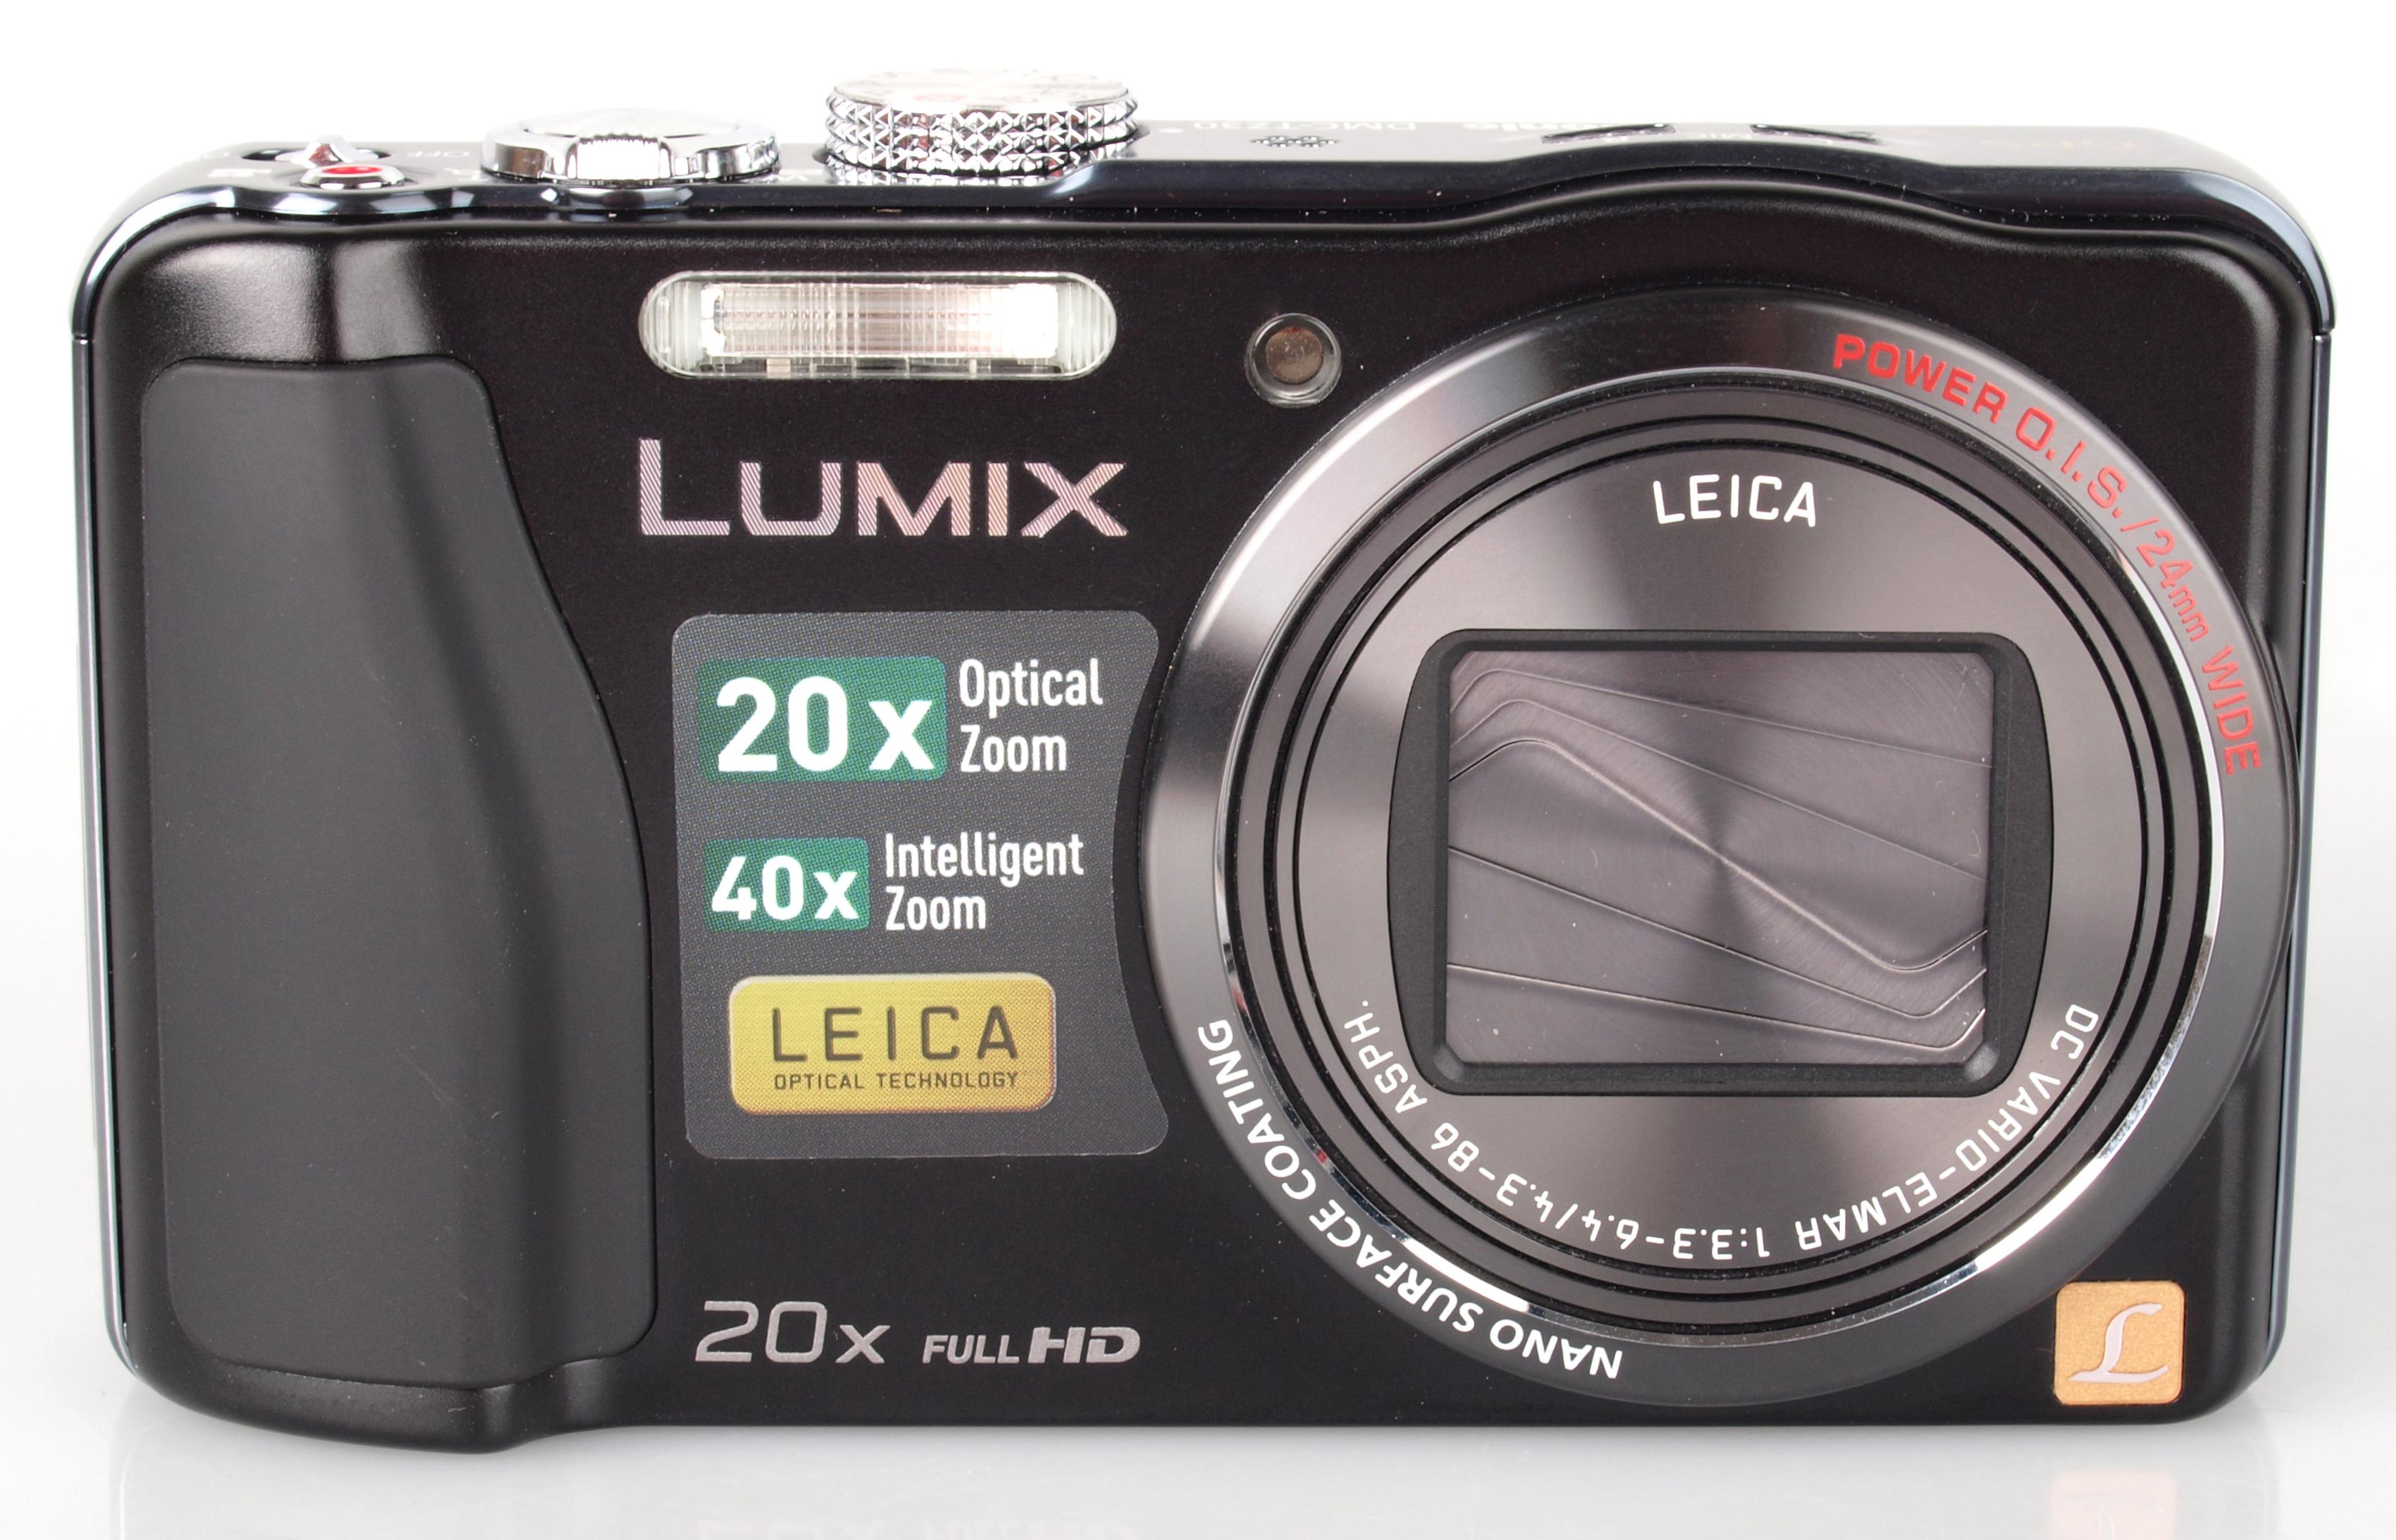 Panasonic lumix tz80 digital camera